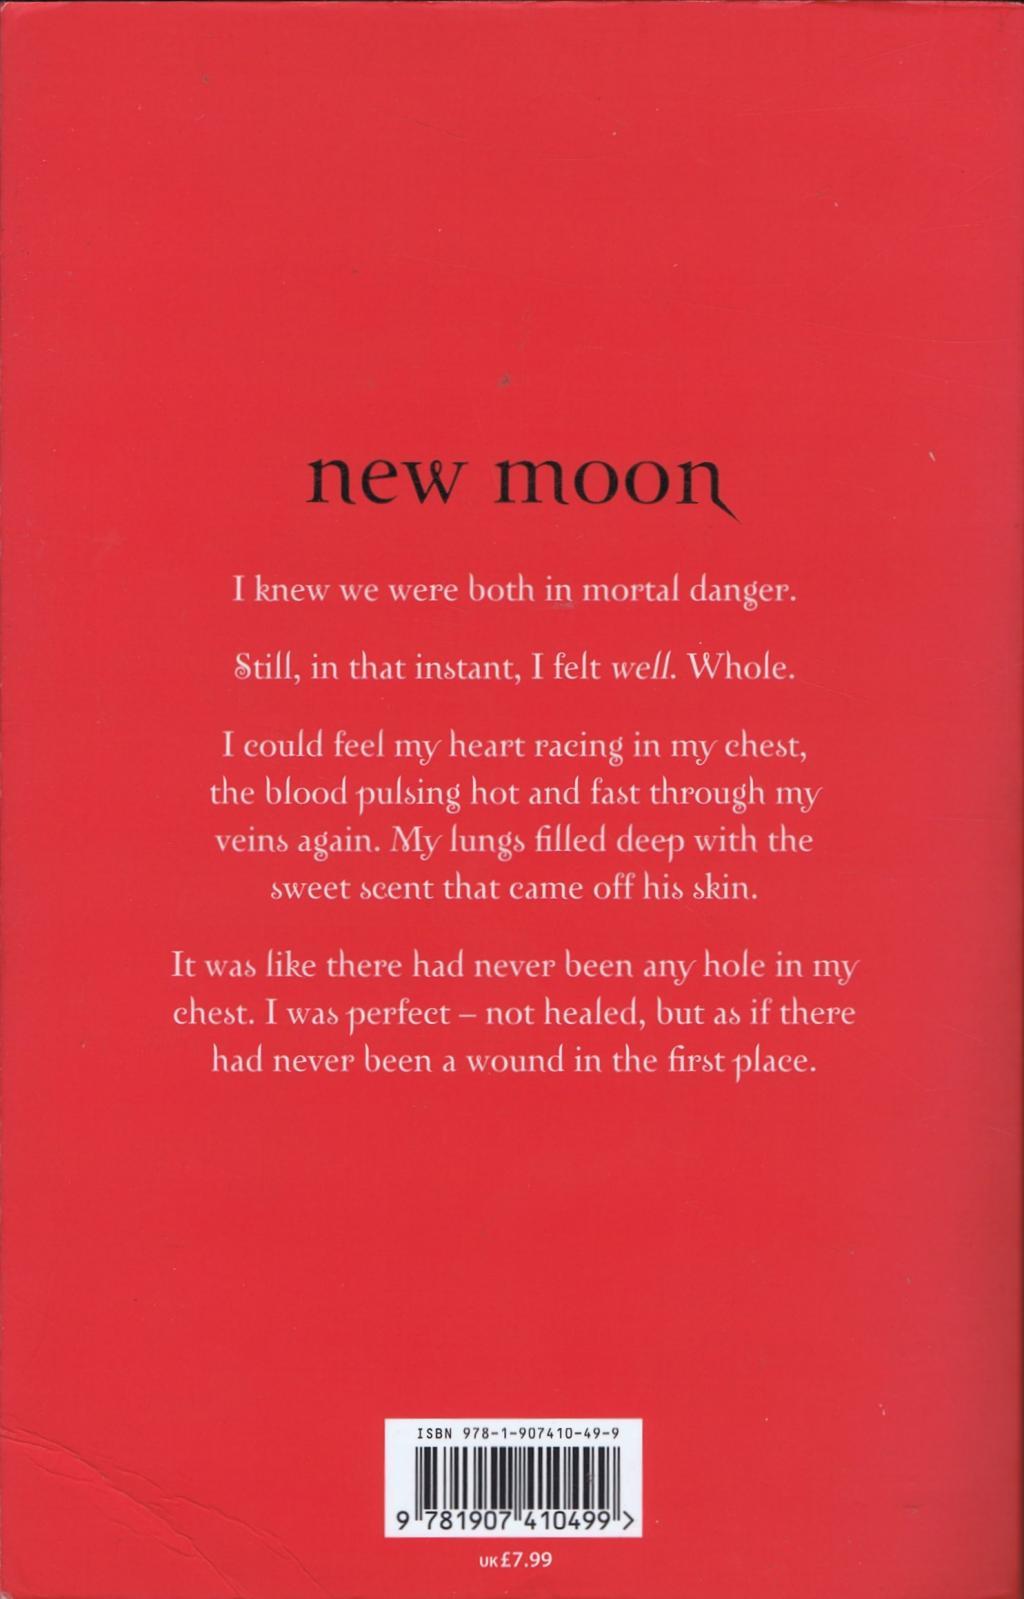 new moon stephenie meyer pdf